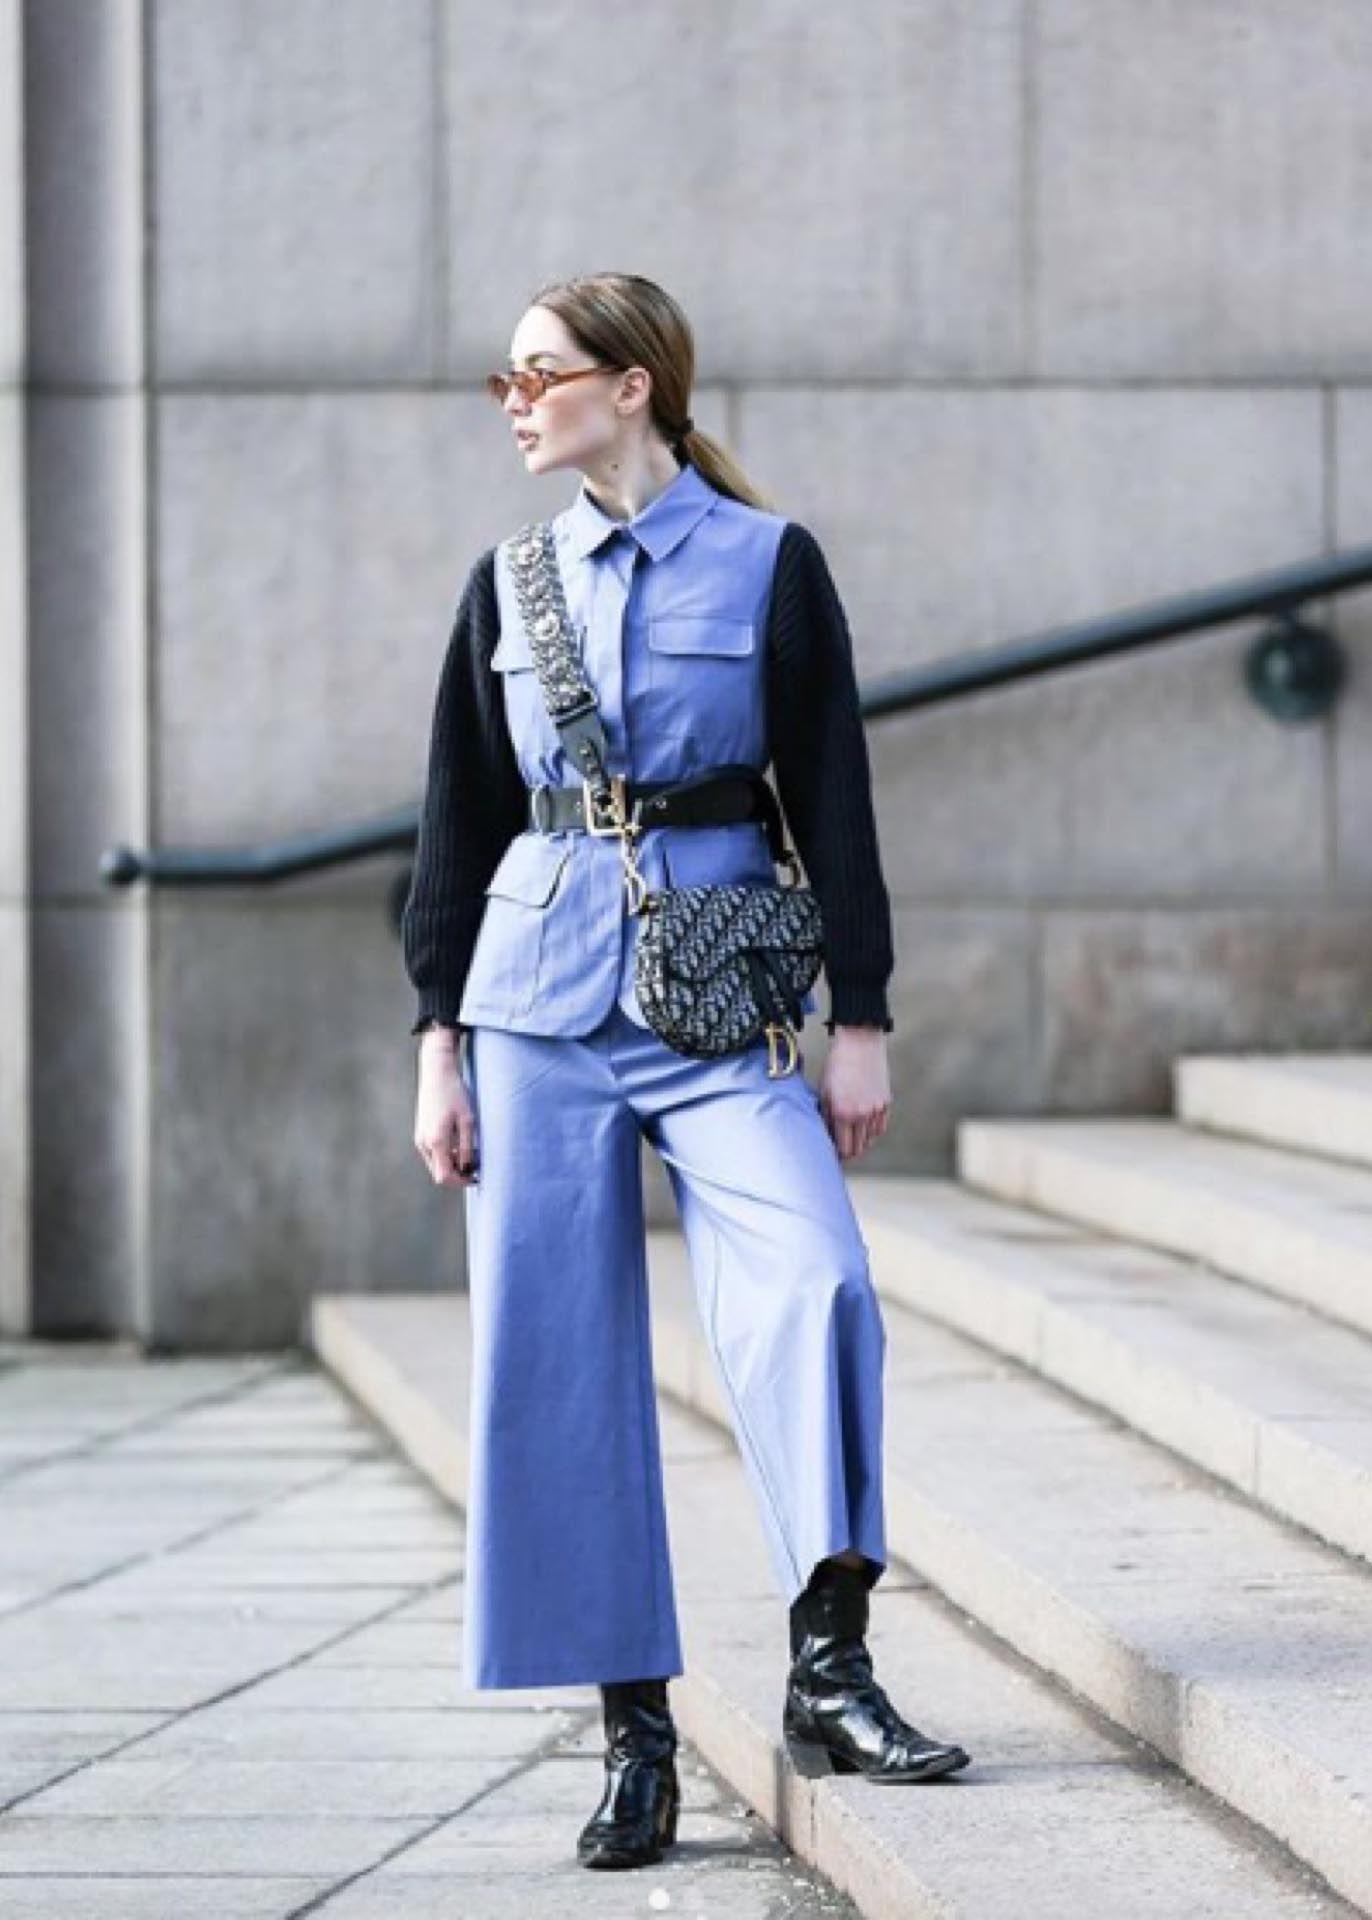 Otro Estilo De Chaqueta Con Cinturón Ancho Abrigos Moda Siluetas Femeninas